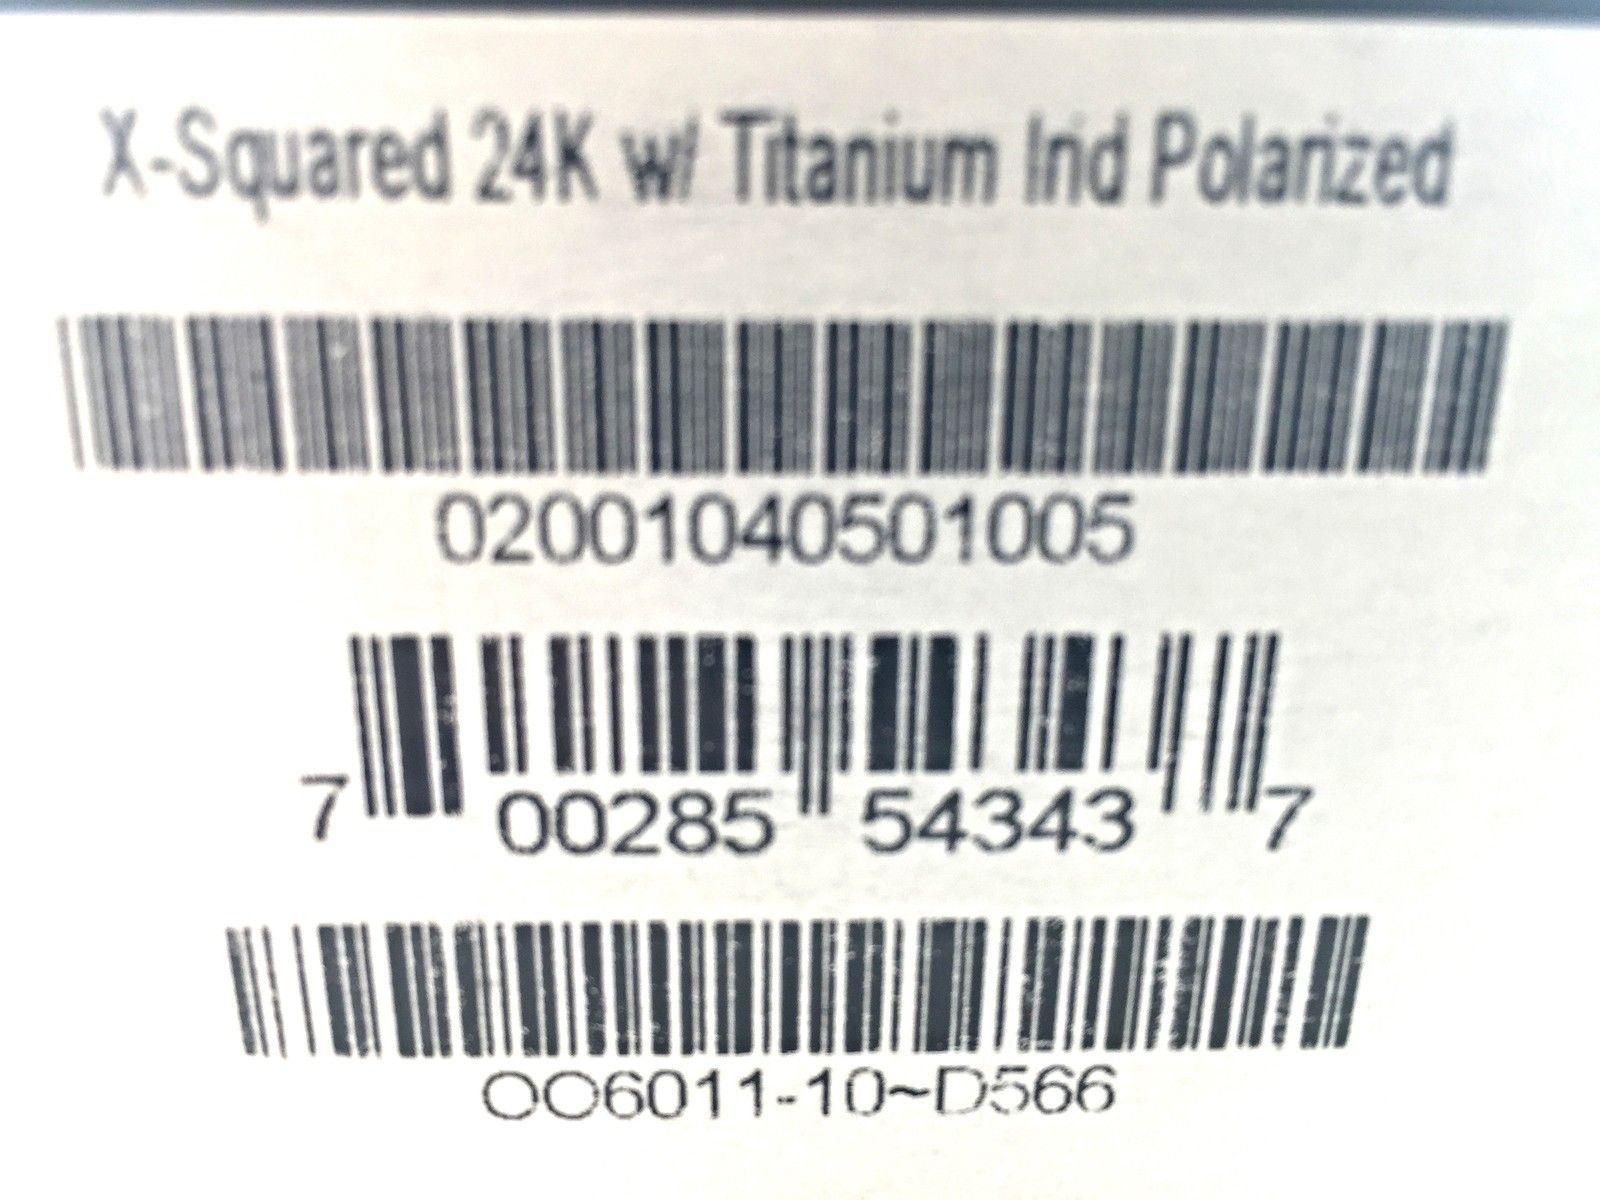 X Squared 24K Complete LNIB (as good as they get) - 16087180370_640c1e19ab_o.jpg